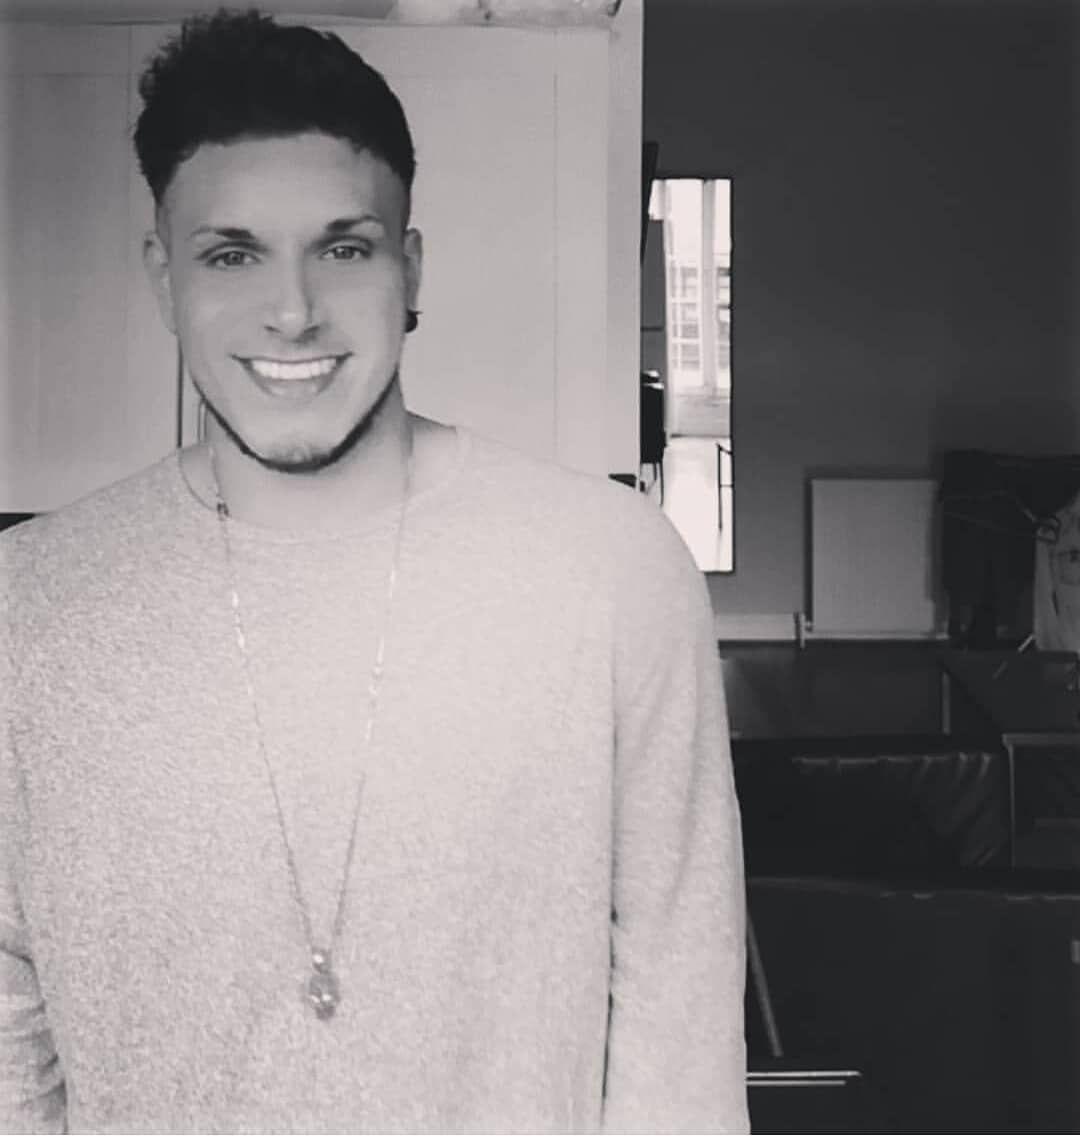 #selfie #me #instagood #instalike #likeforlike #like4like #likeforfollow #like4follow #photo #picoftheday #photooftheday #pictureoftheday #picture #mood #instamood #cool #instacool #like #follow #rome #italy #mood #style #smile #blackandwhite